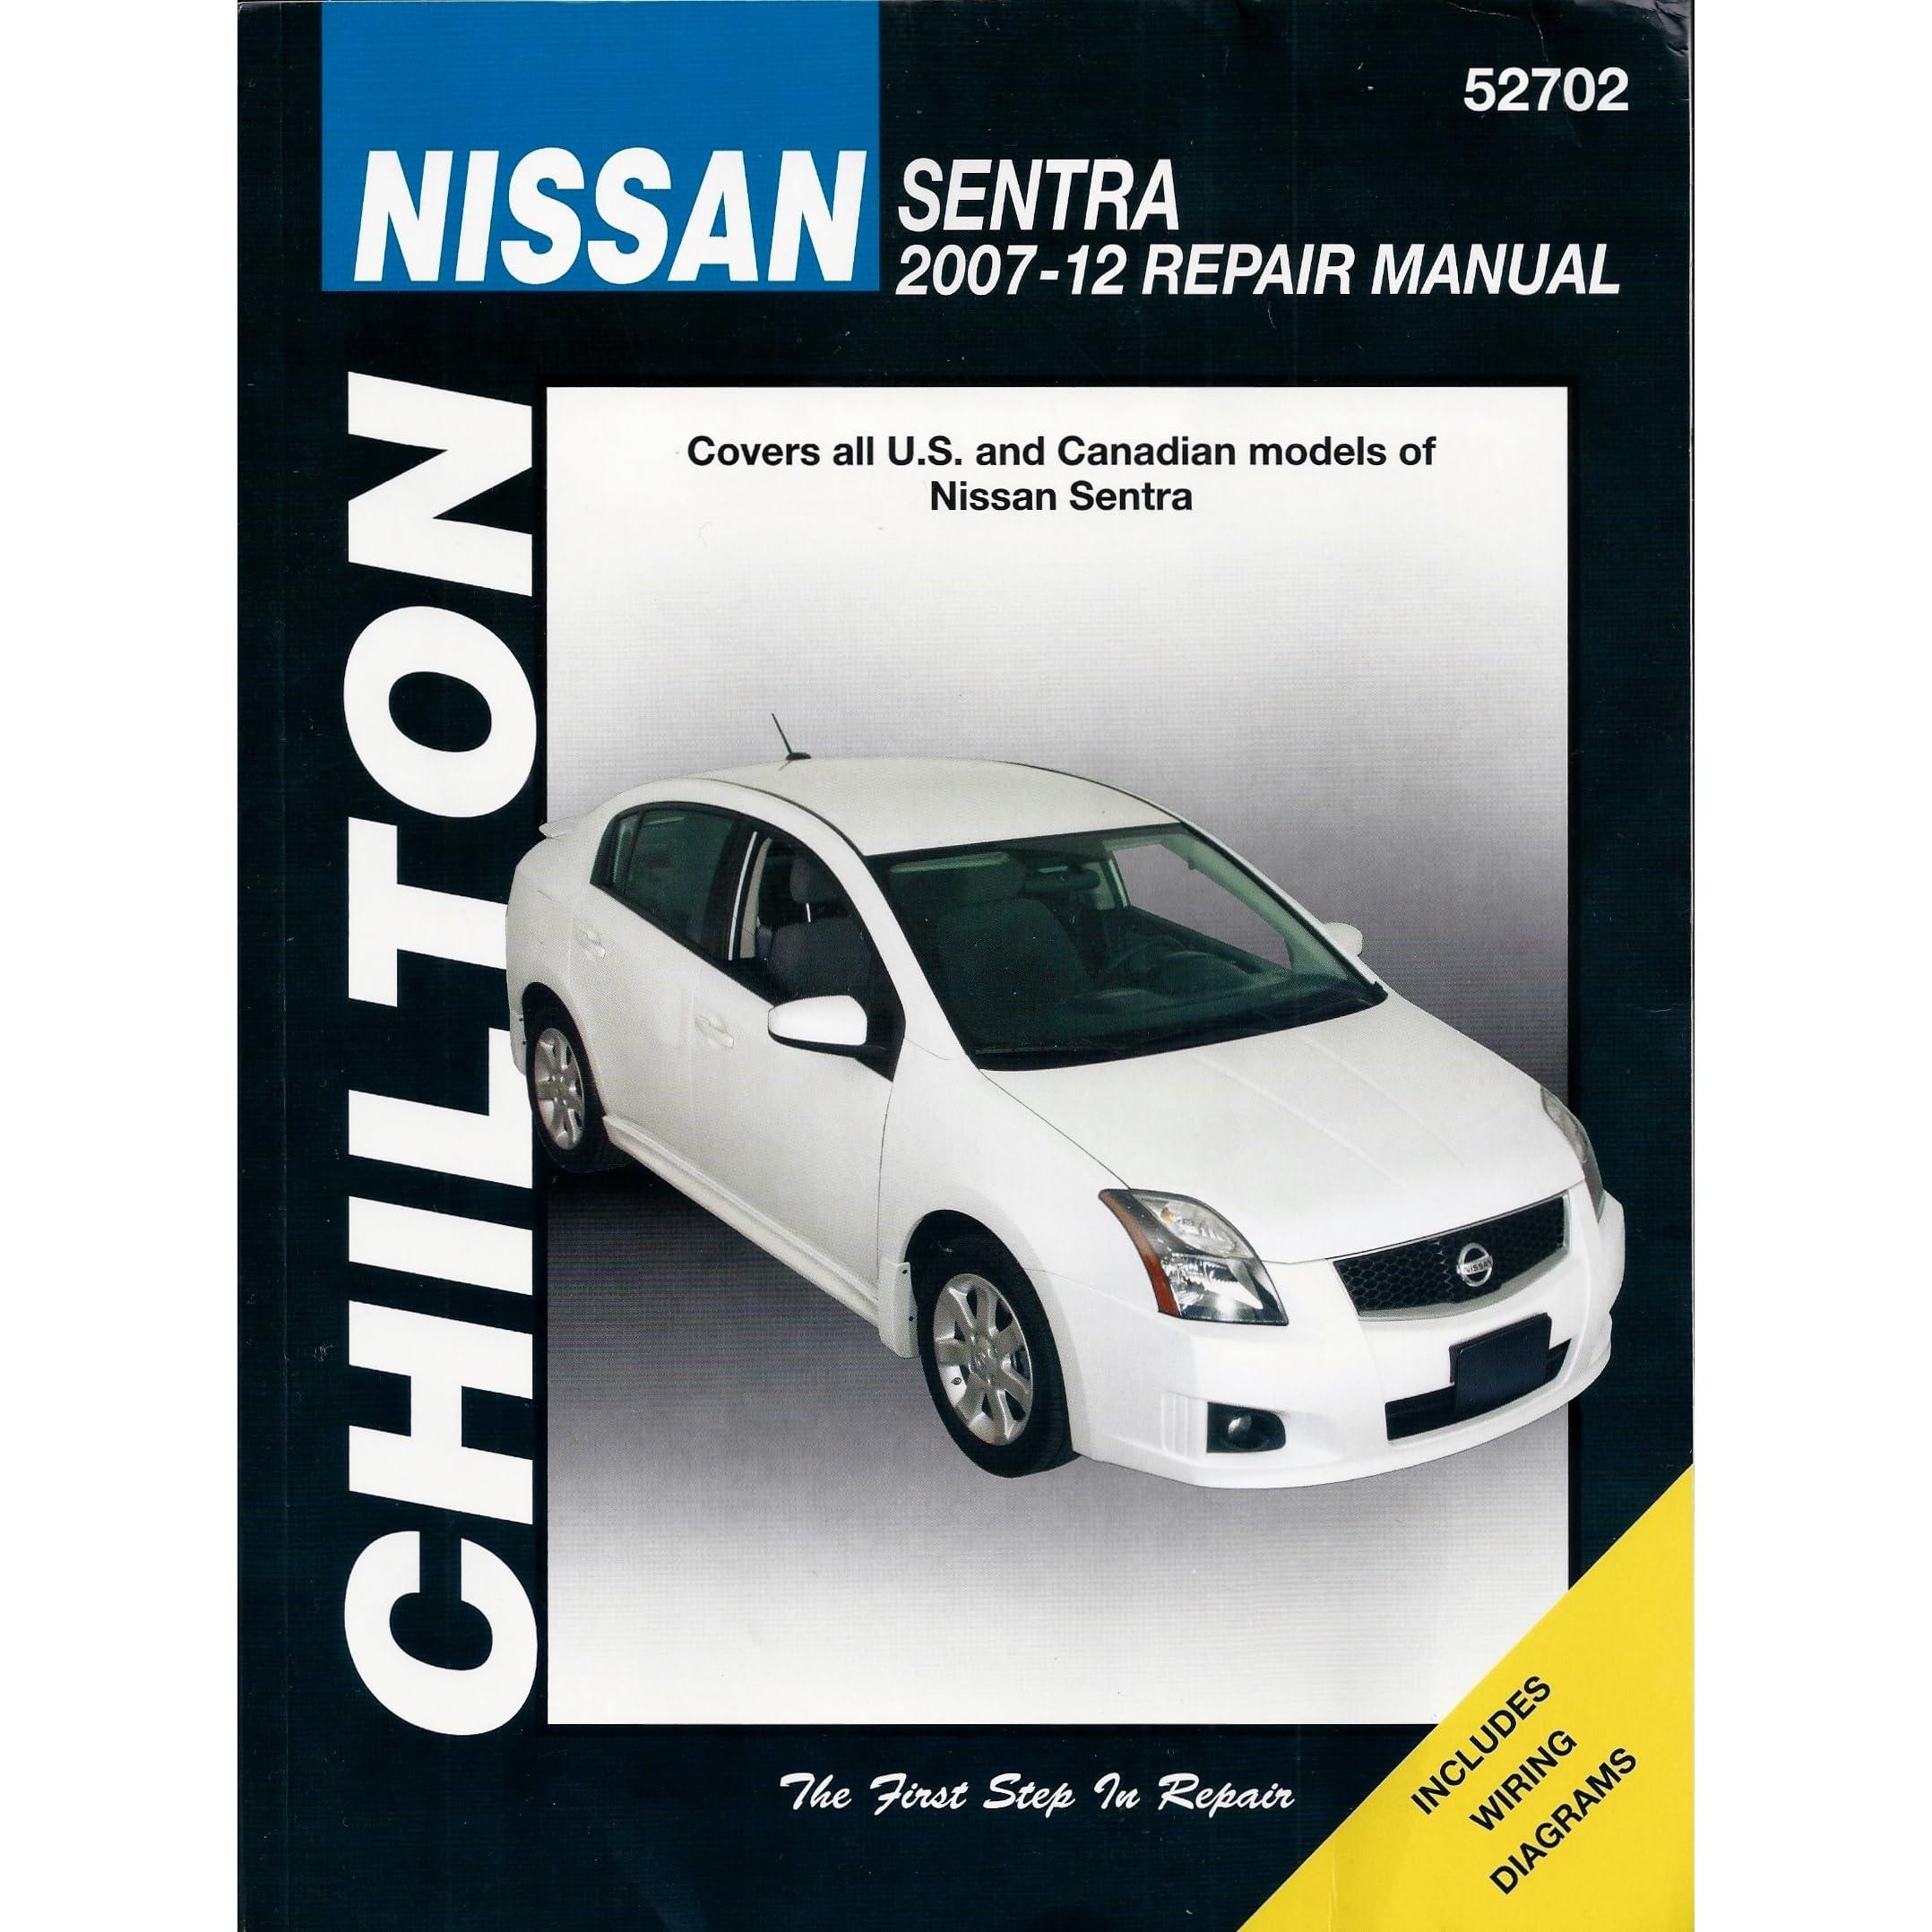 chilton s 2007 12 nissan sentra repair manual by jeff killingsworth rh goodreads com nissan sentra 2007 repair manual alternator nissan maxima 2007 repair manual